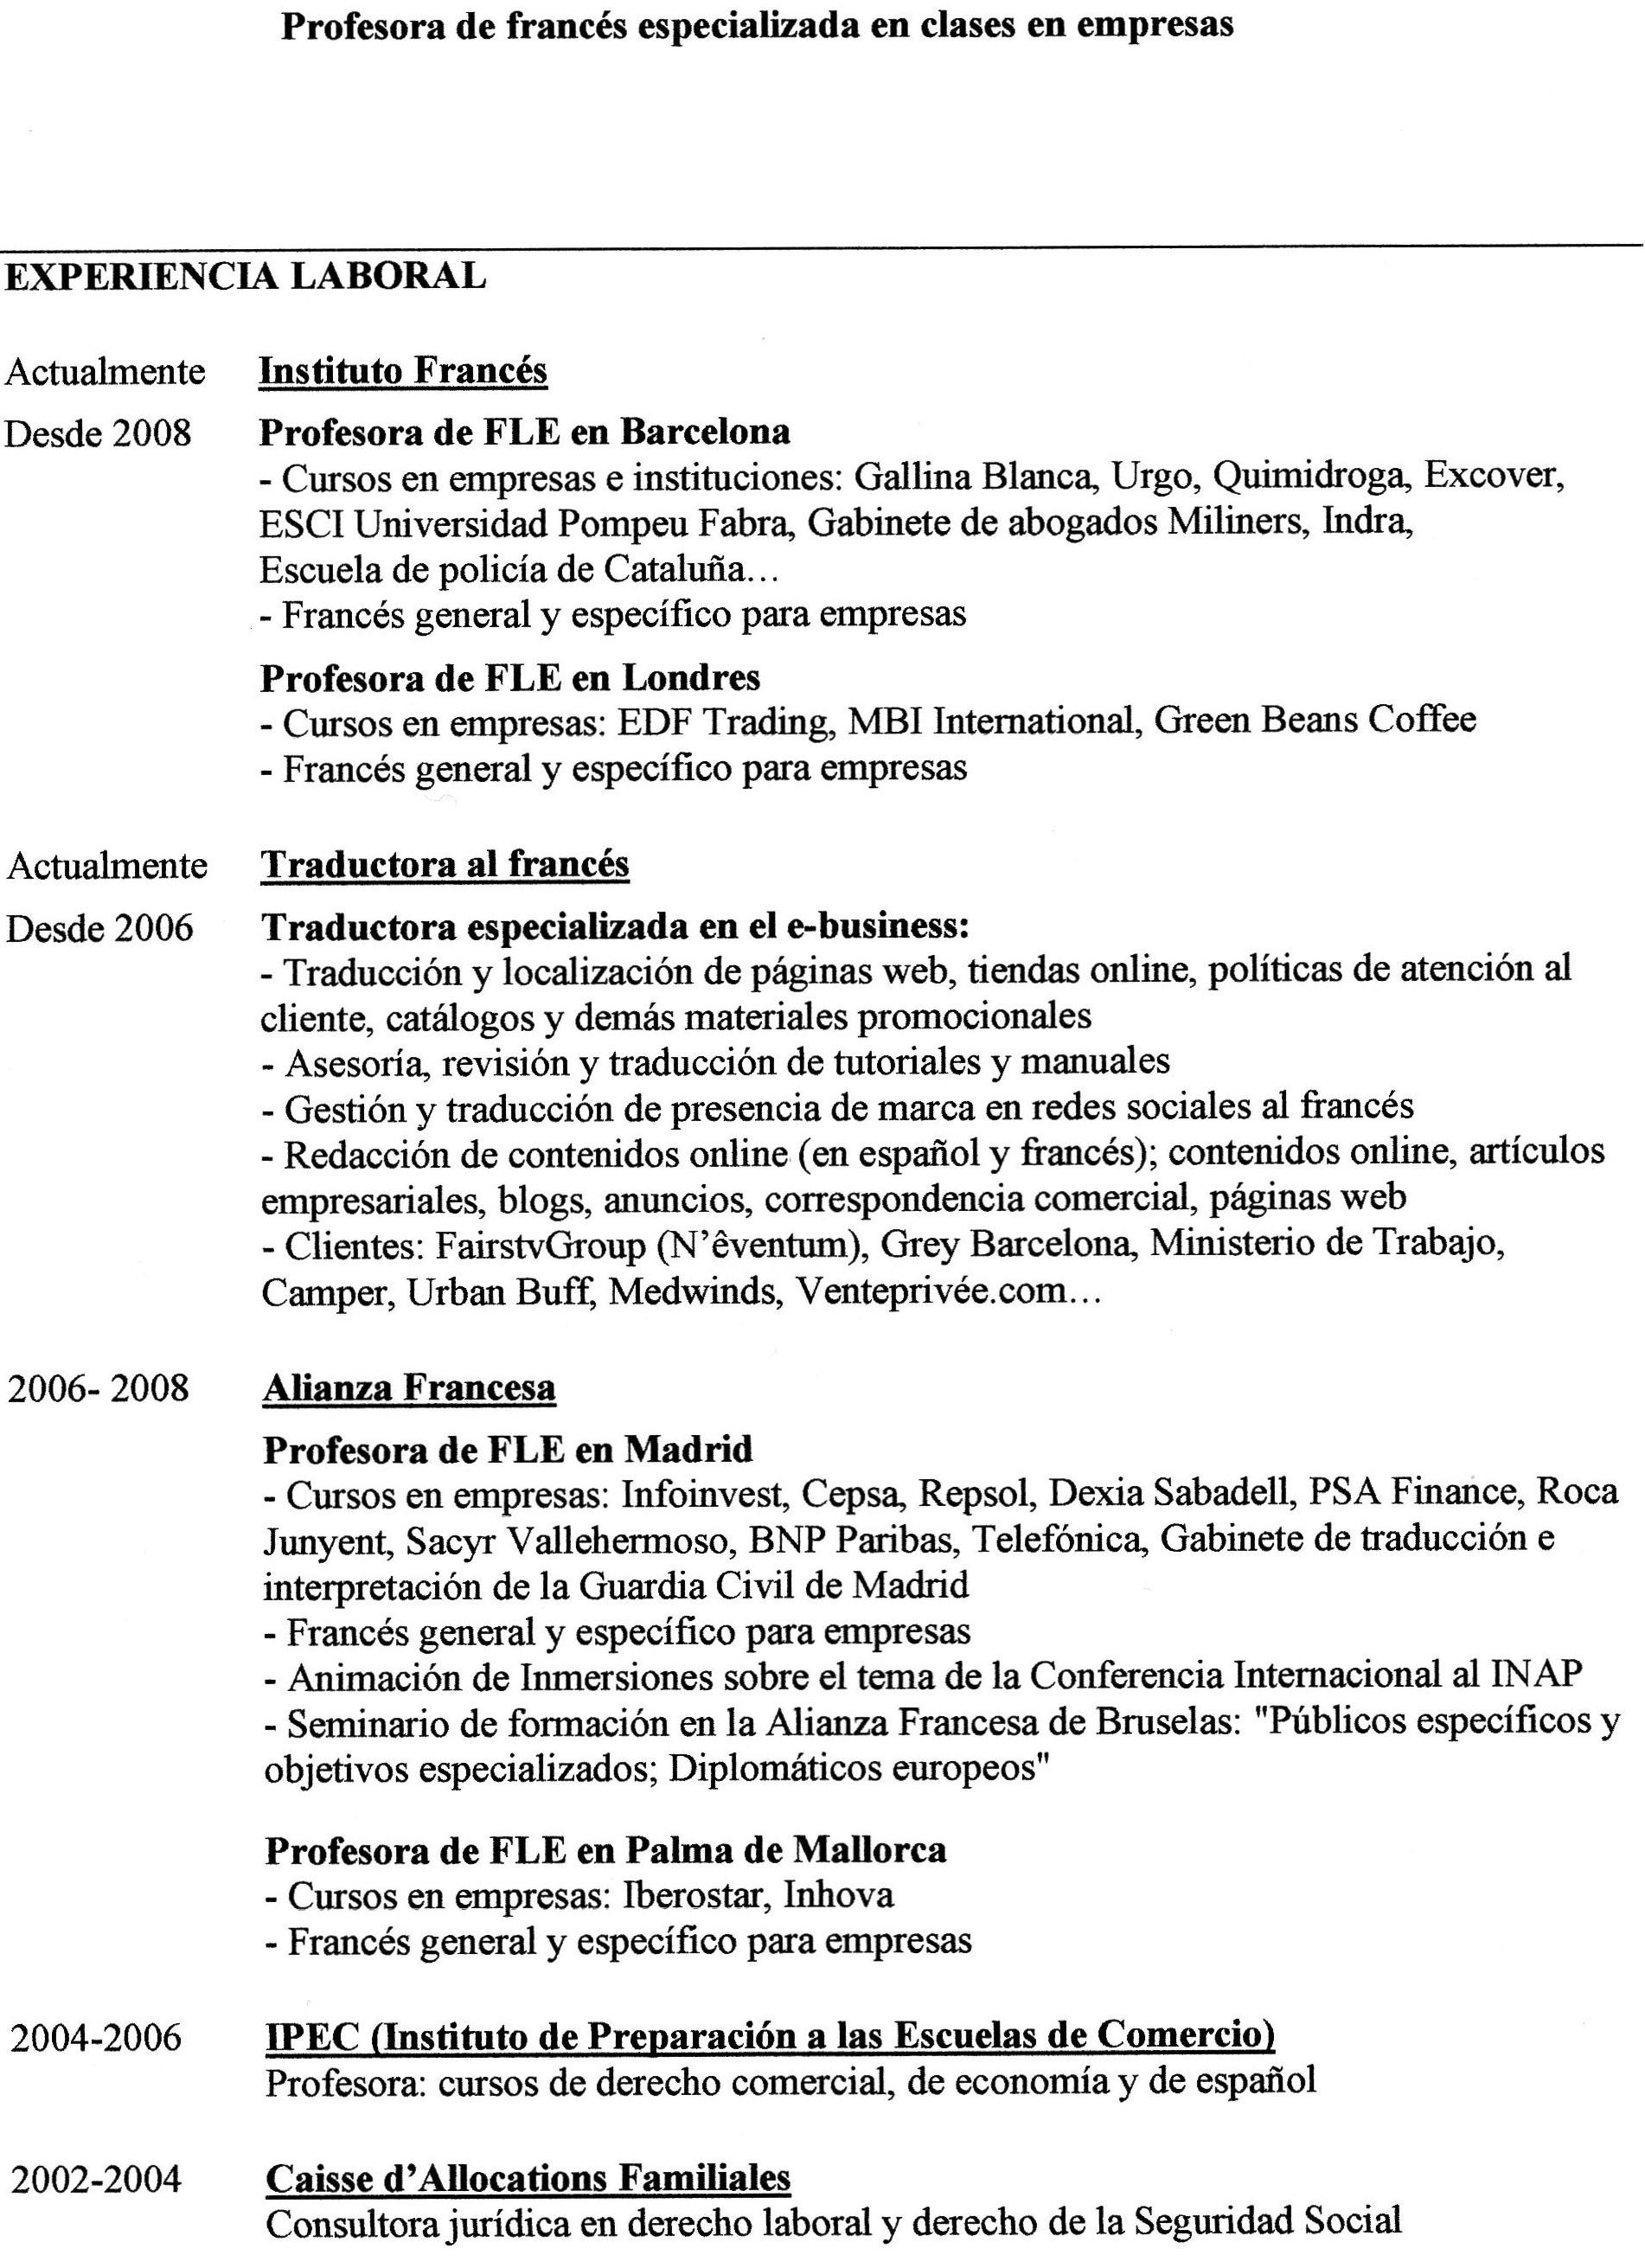 cv profesor frances